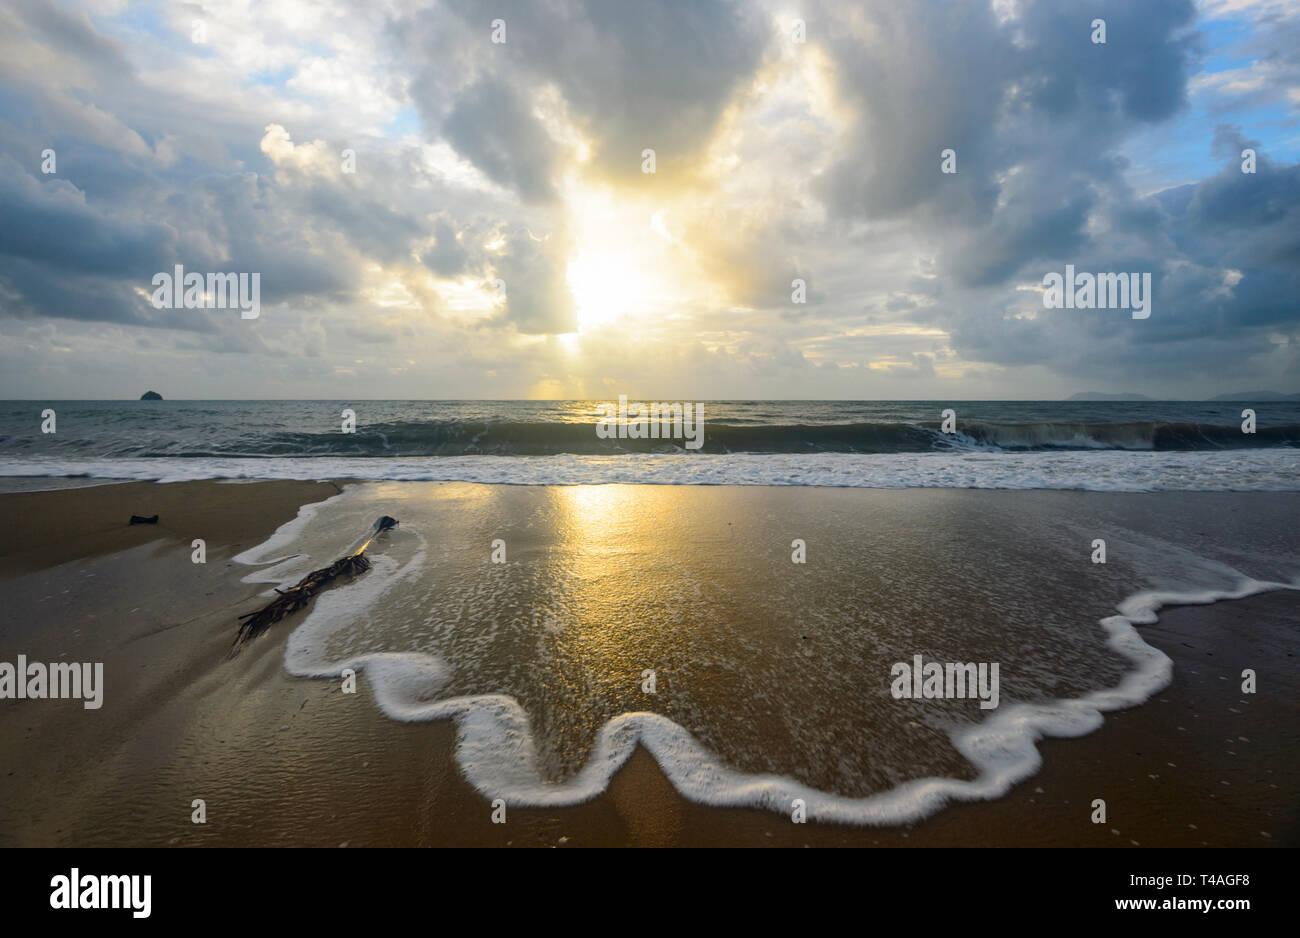 Suaves olas spume al amanecer, Palm Cove, playas del norte de Cairns, Far North Queensland, FNQ, Queensland, Australia Imagen De Stock